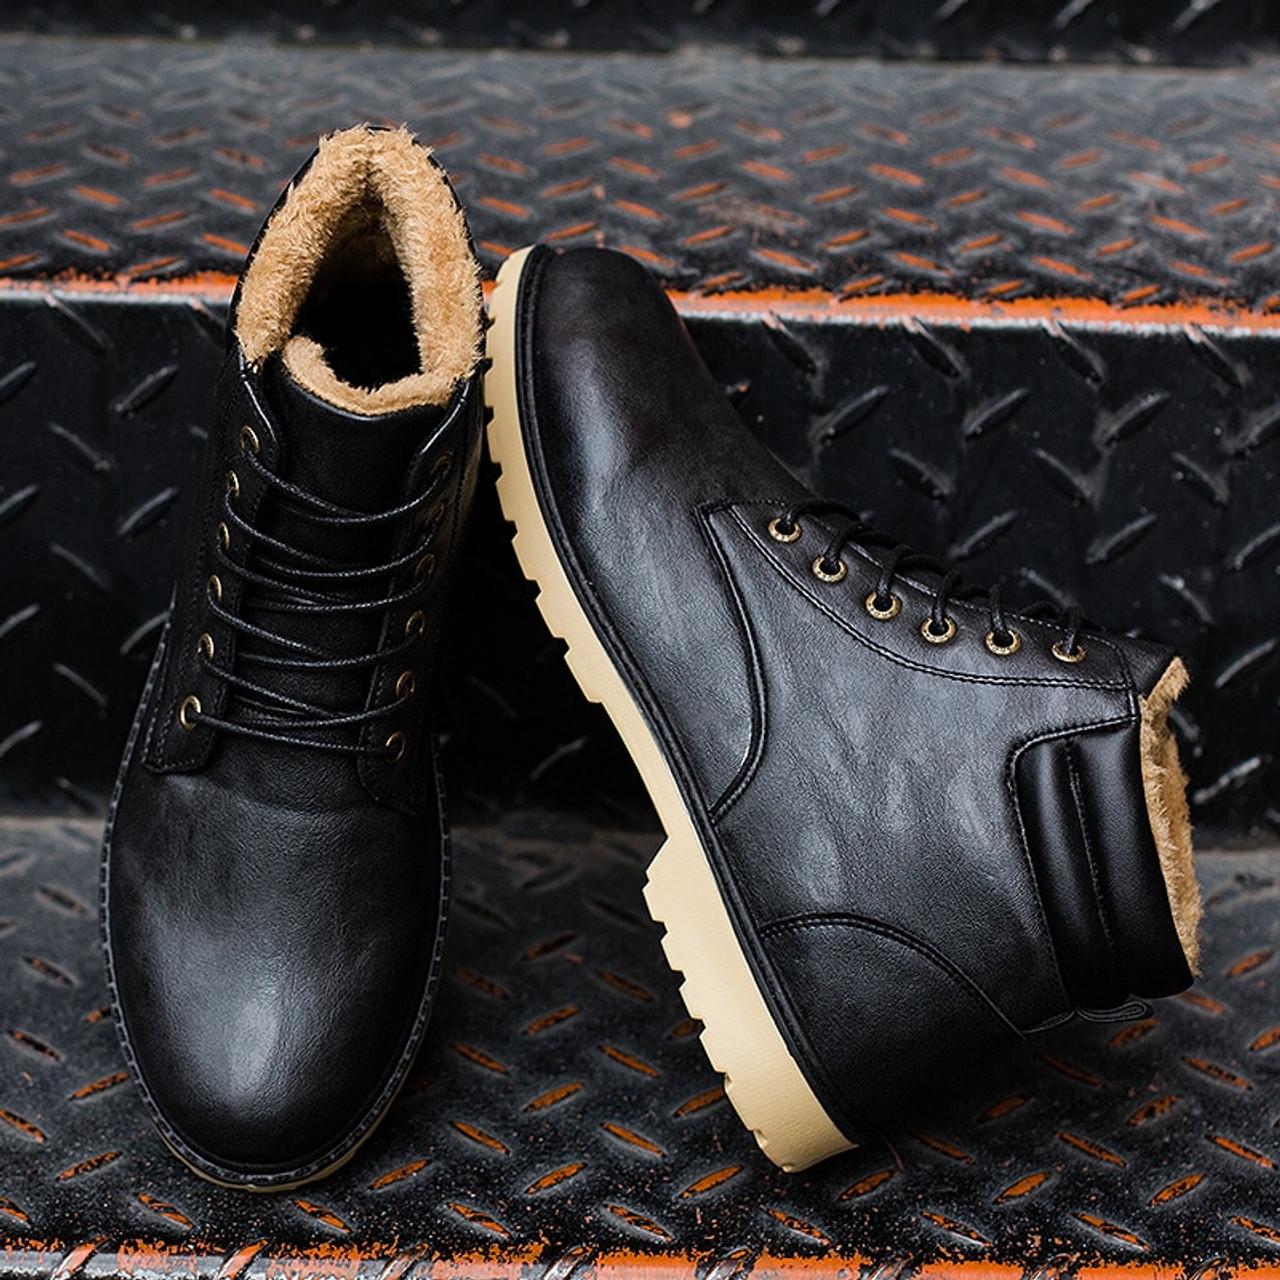 6f722da4385 Mens Boots Winter Ankle Fashion Classic Shoes Plush Warm Man Snow Boots  2018 Hot Sales Quality Leather Winter Shoes Men